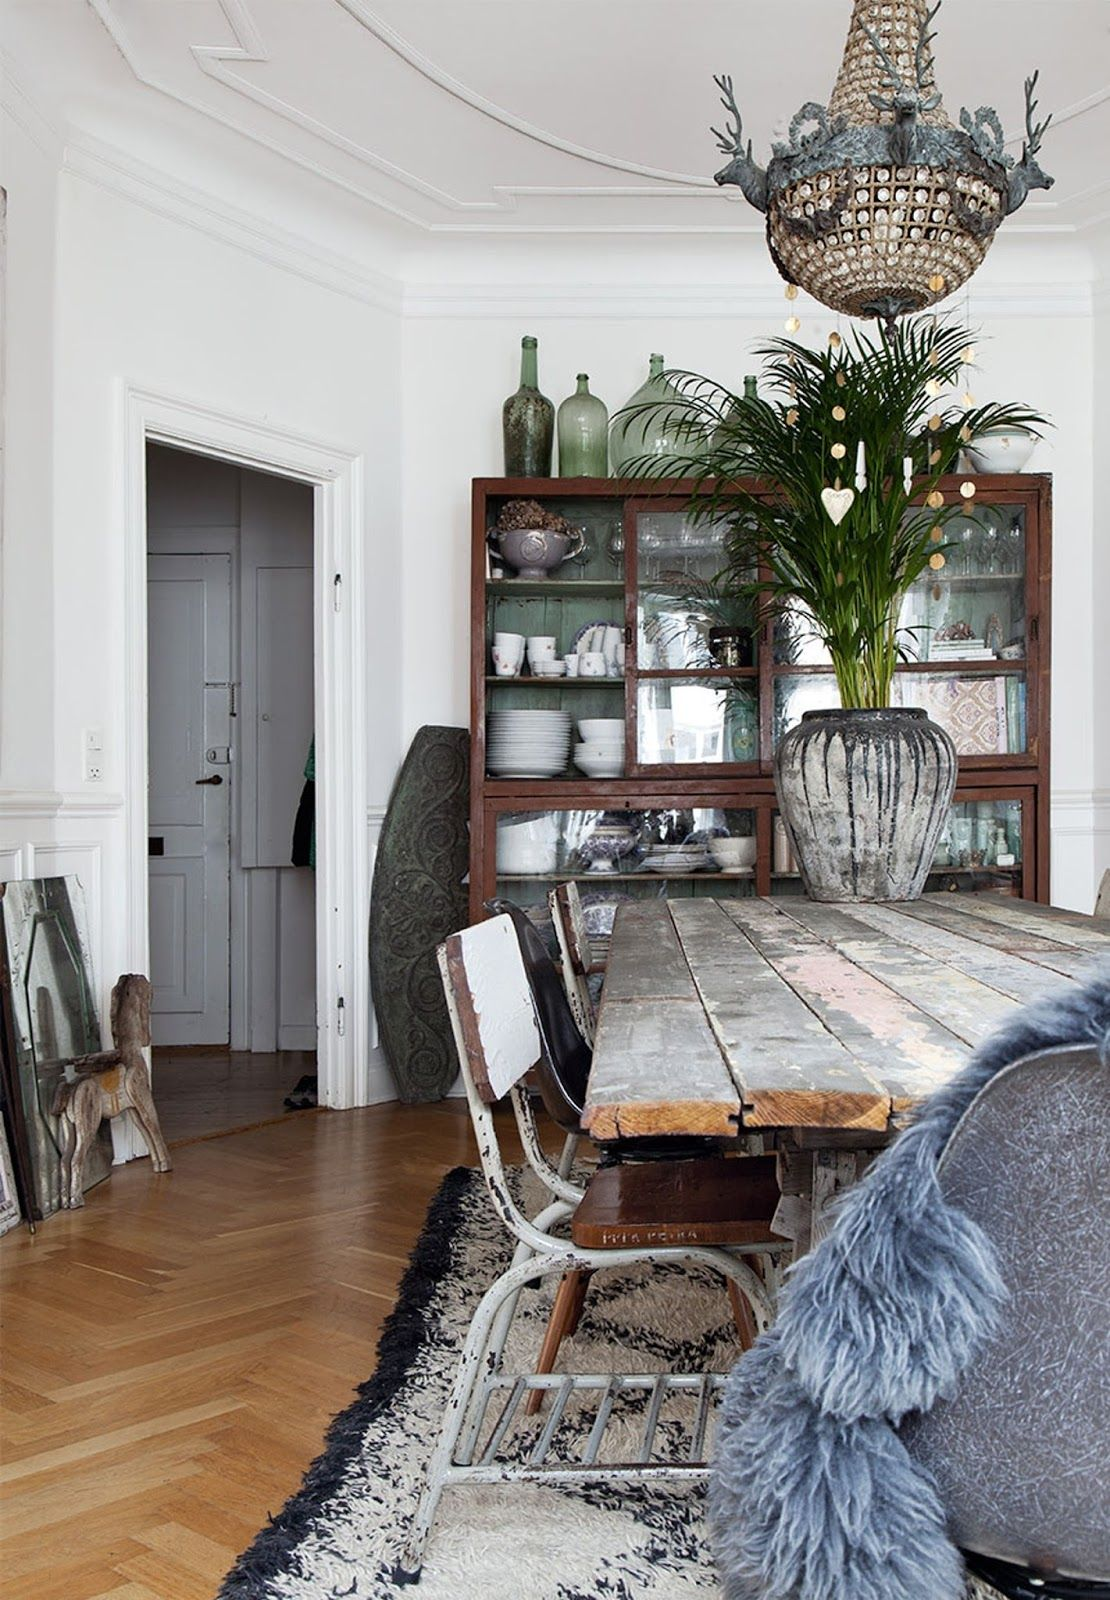 House rustic bohemian interior wall art